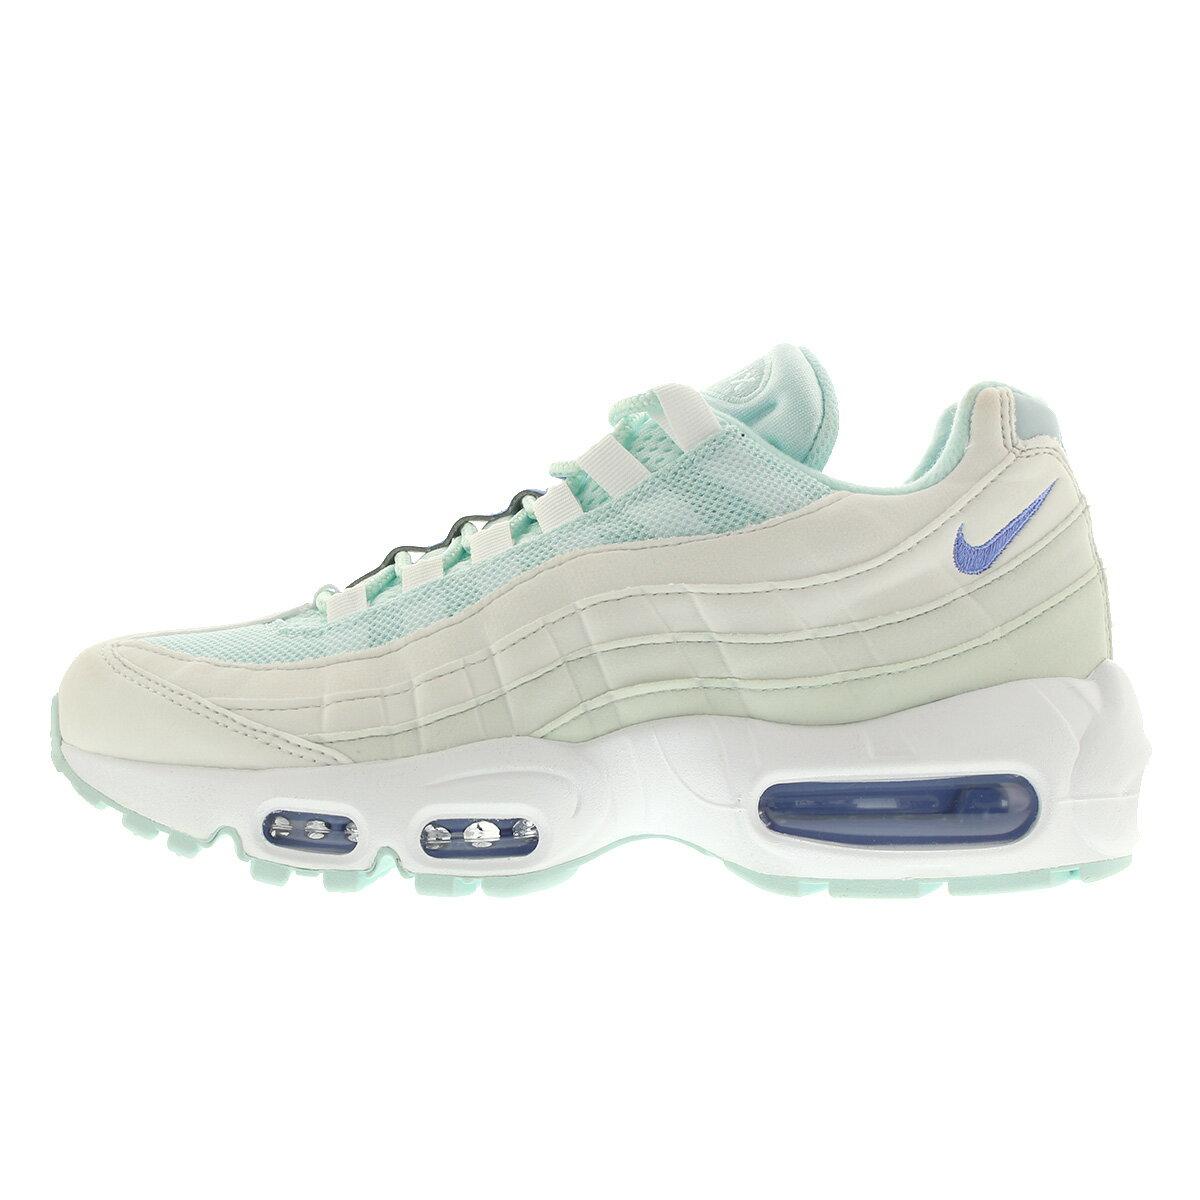 NIKE WMNS AIR MAX 95 Nike women Air Max 95 TEAL TINTROYAL PULSEWHITE 307,960 306